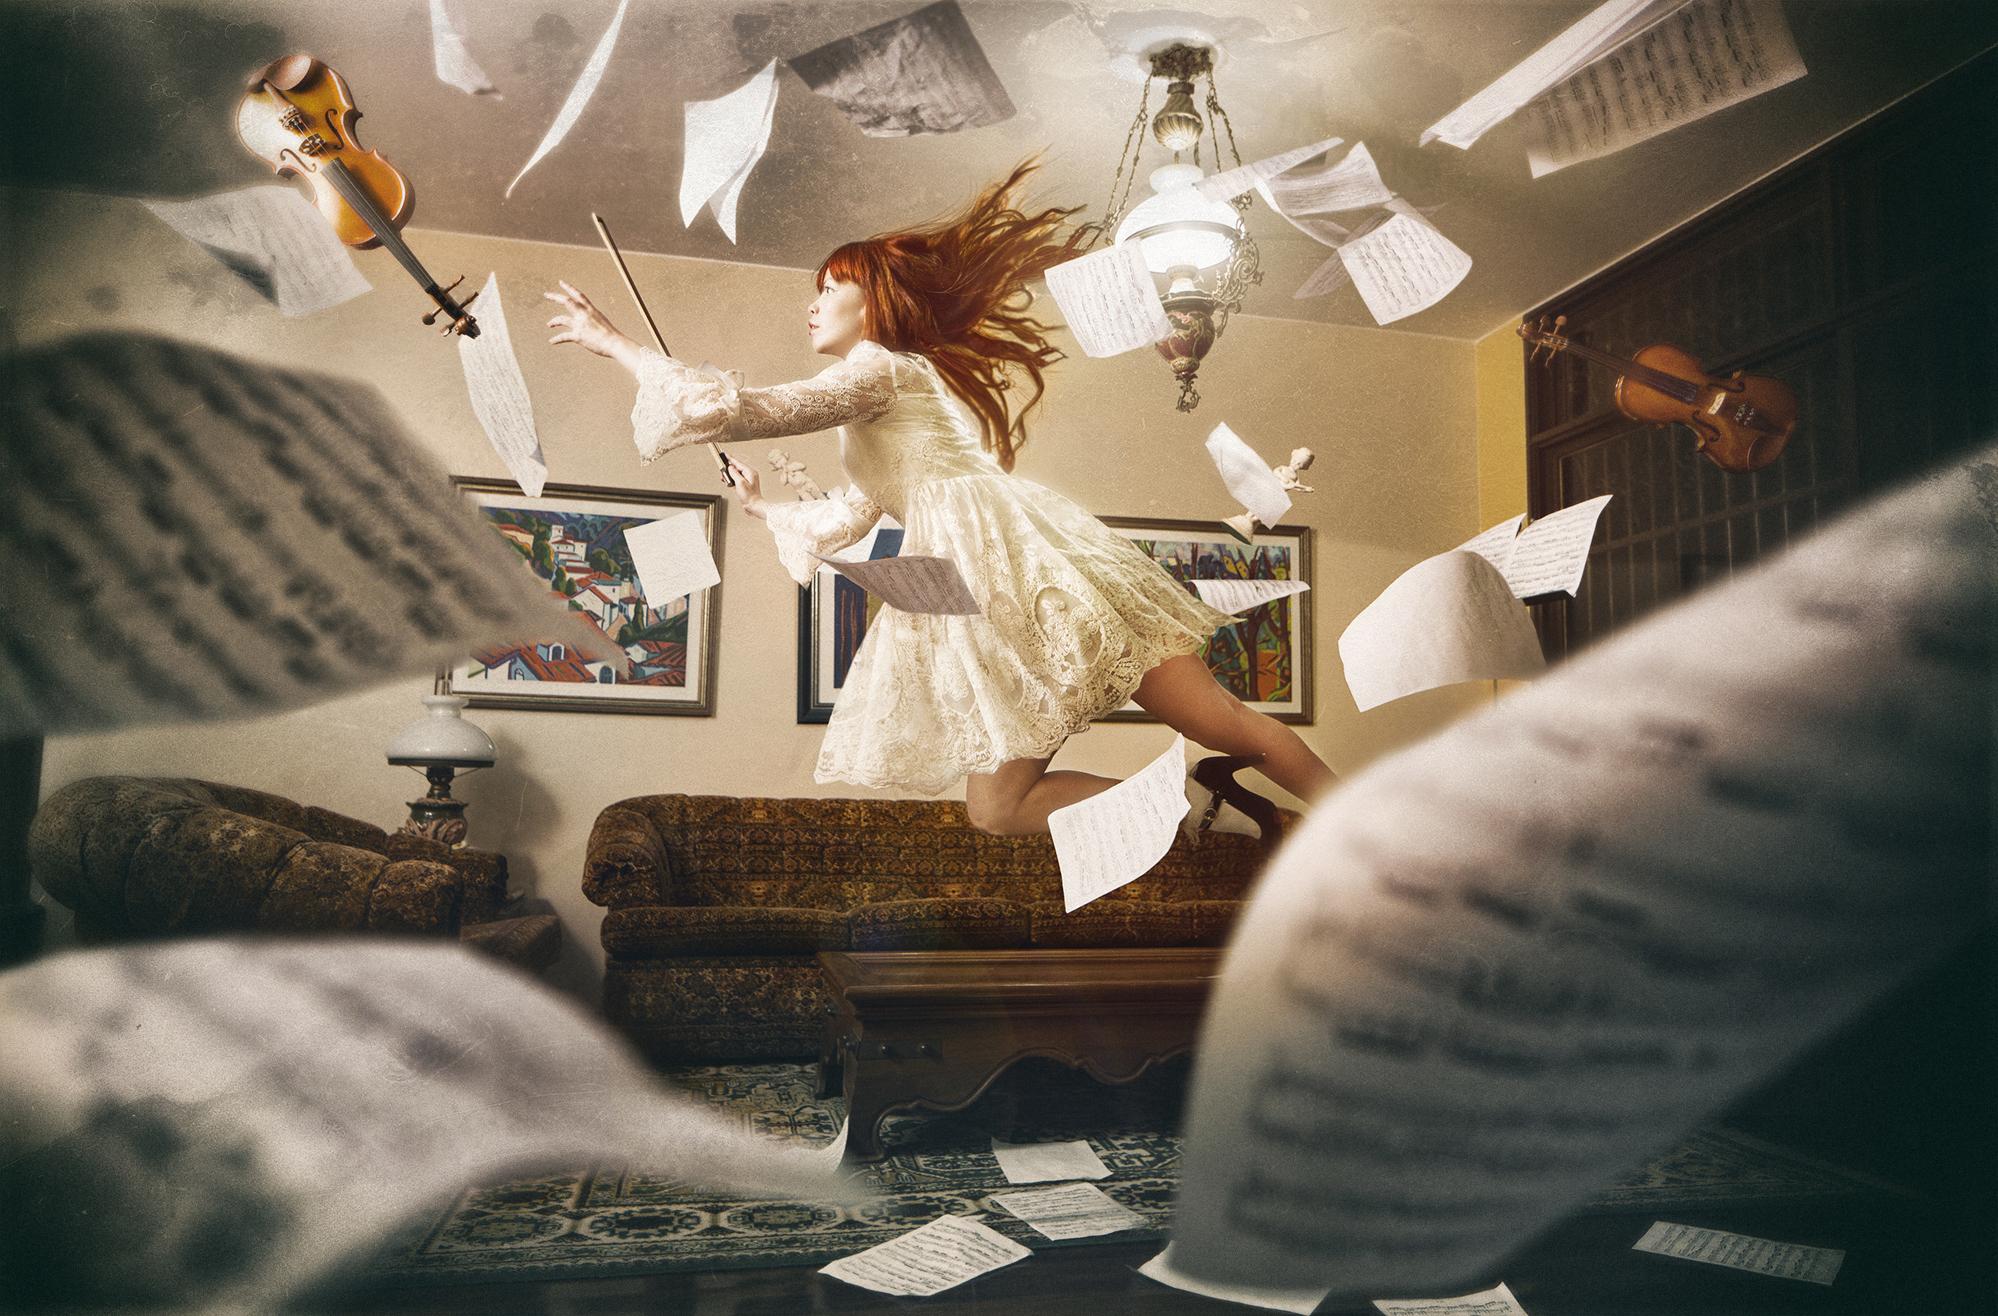 Rafael Ohana Photography - Gwen Von Sousuke Art (GwenVonS) - Fly